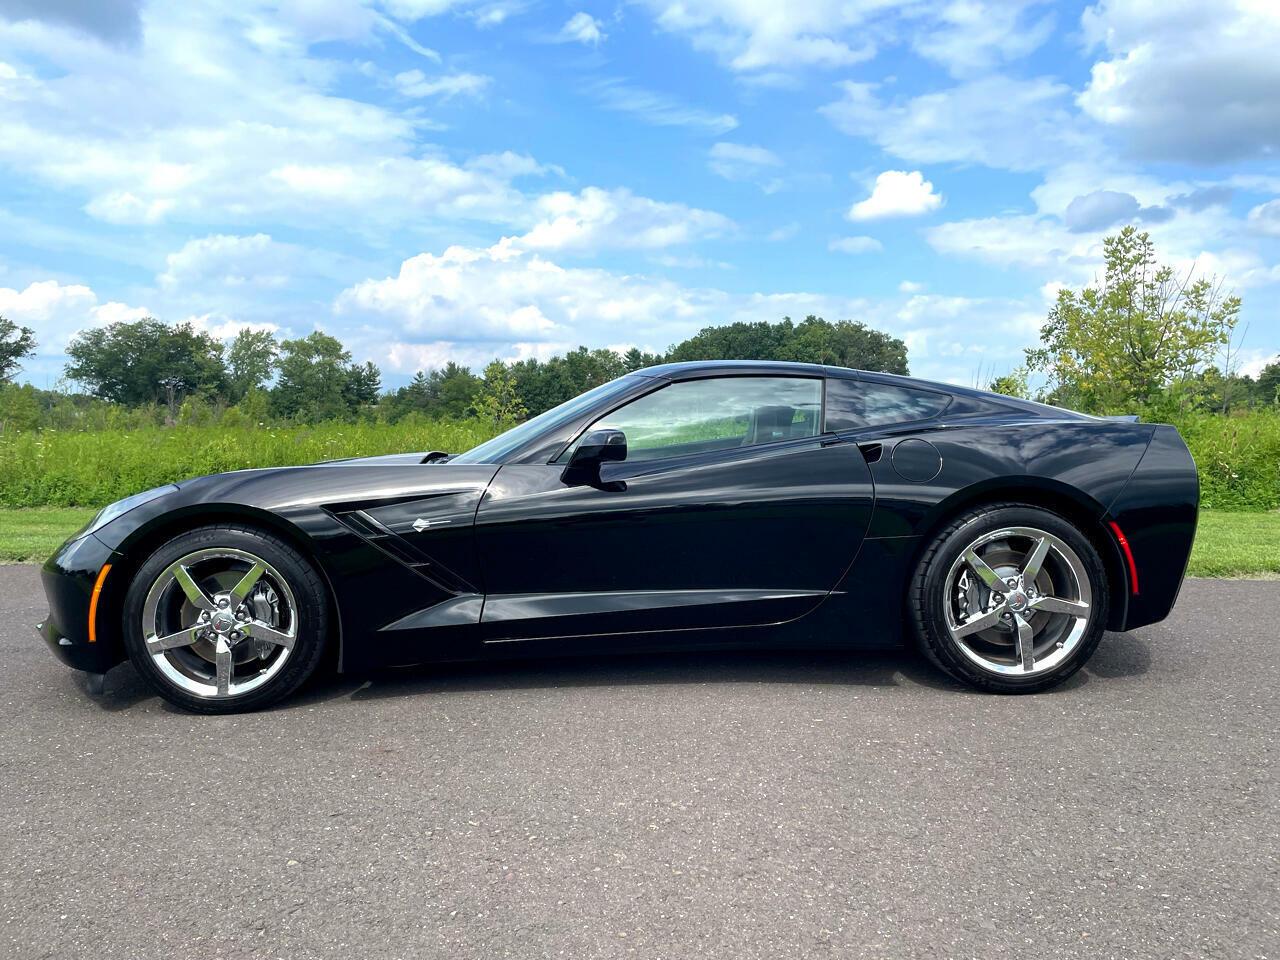 2014 Black Chevrolet Corvette Coupe 3LT | C7 Corvette Photo 7